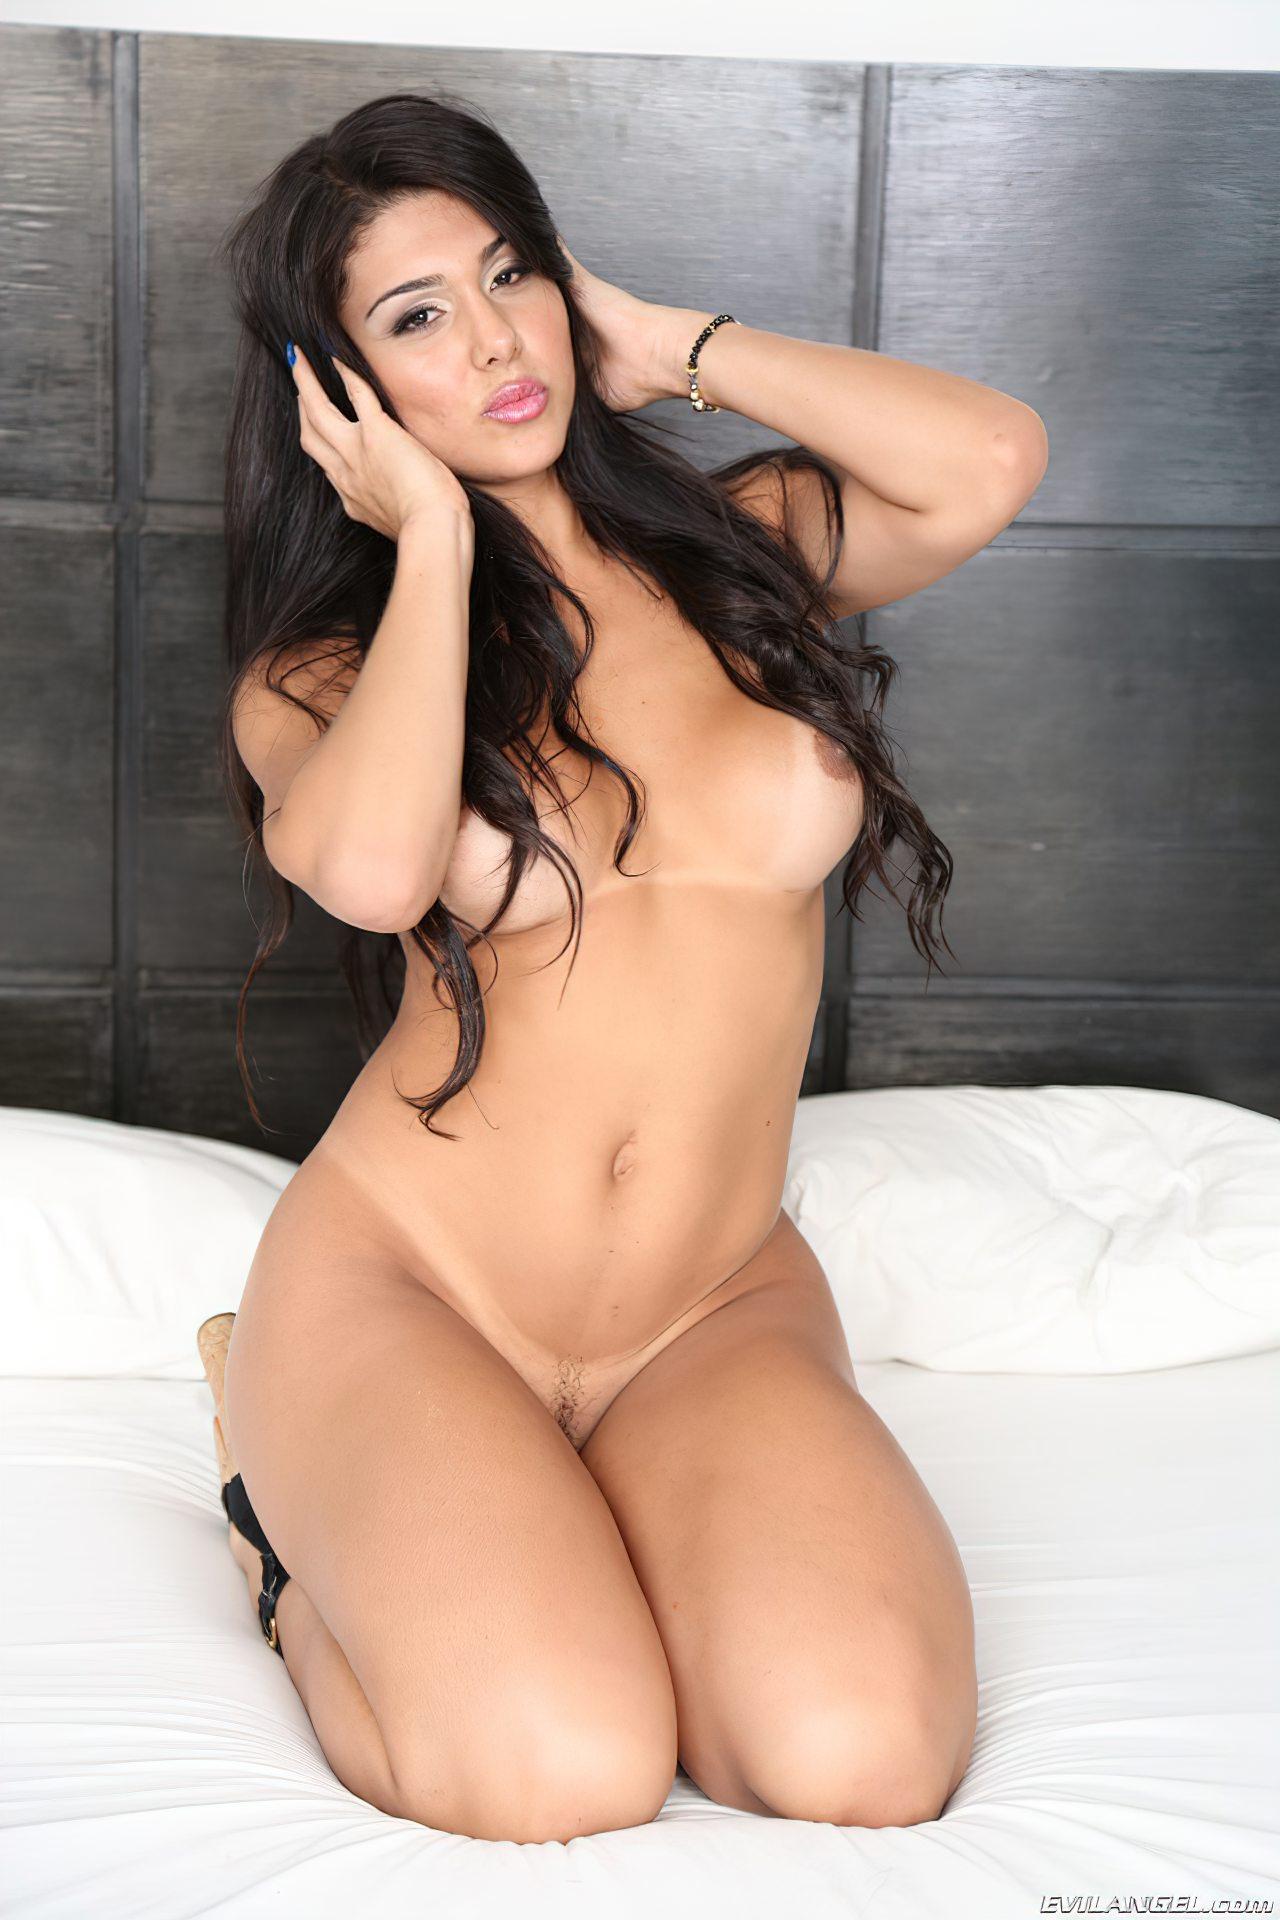 Jessy Lemos Travesti Nua (6)